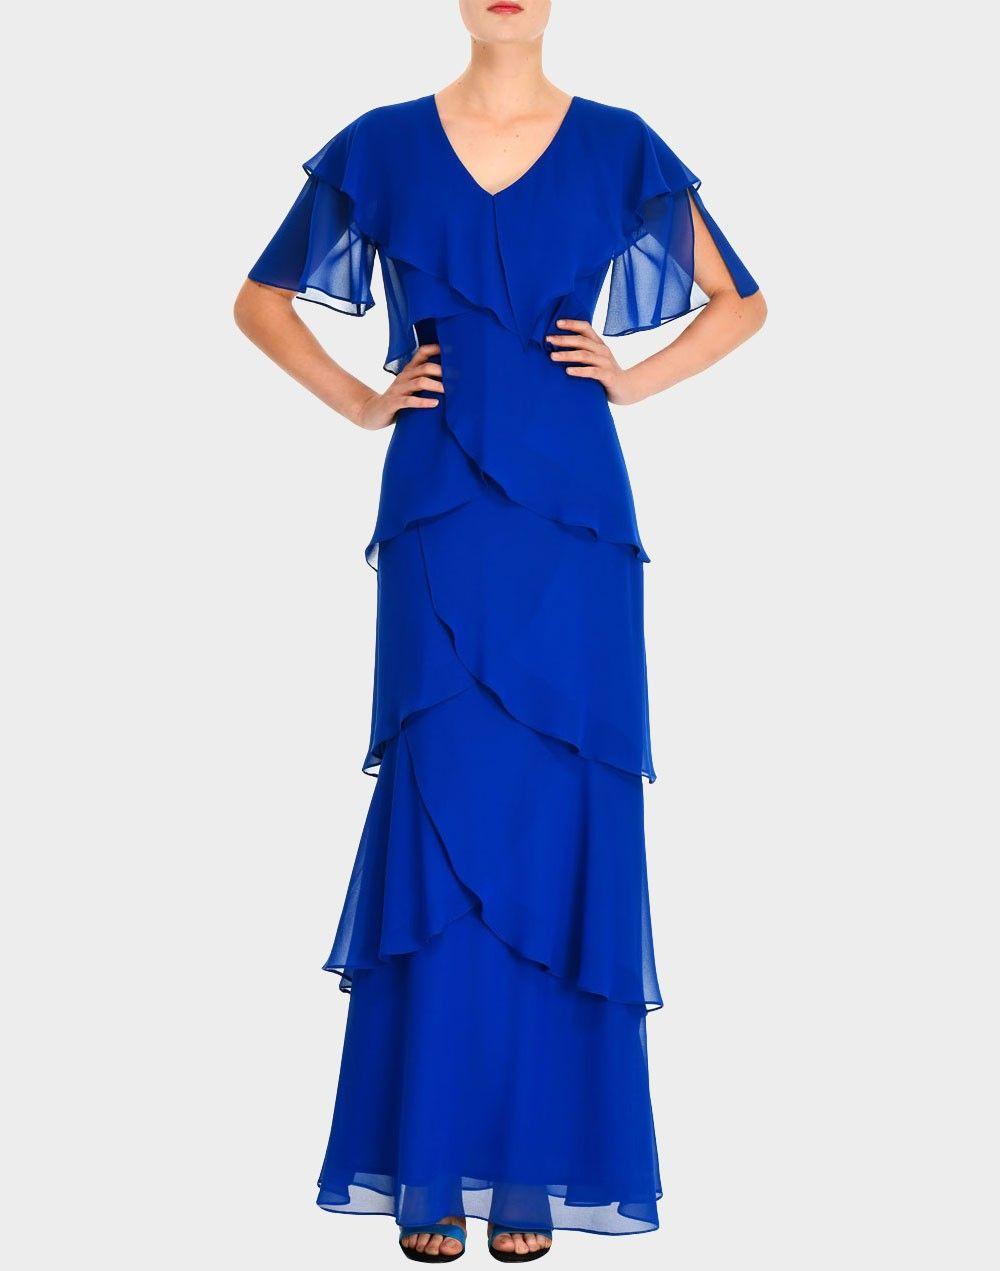 8b0a2346f Vestido largo de capas cruzadas azul de LAMUSA Woman para INVITADISIMA